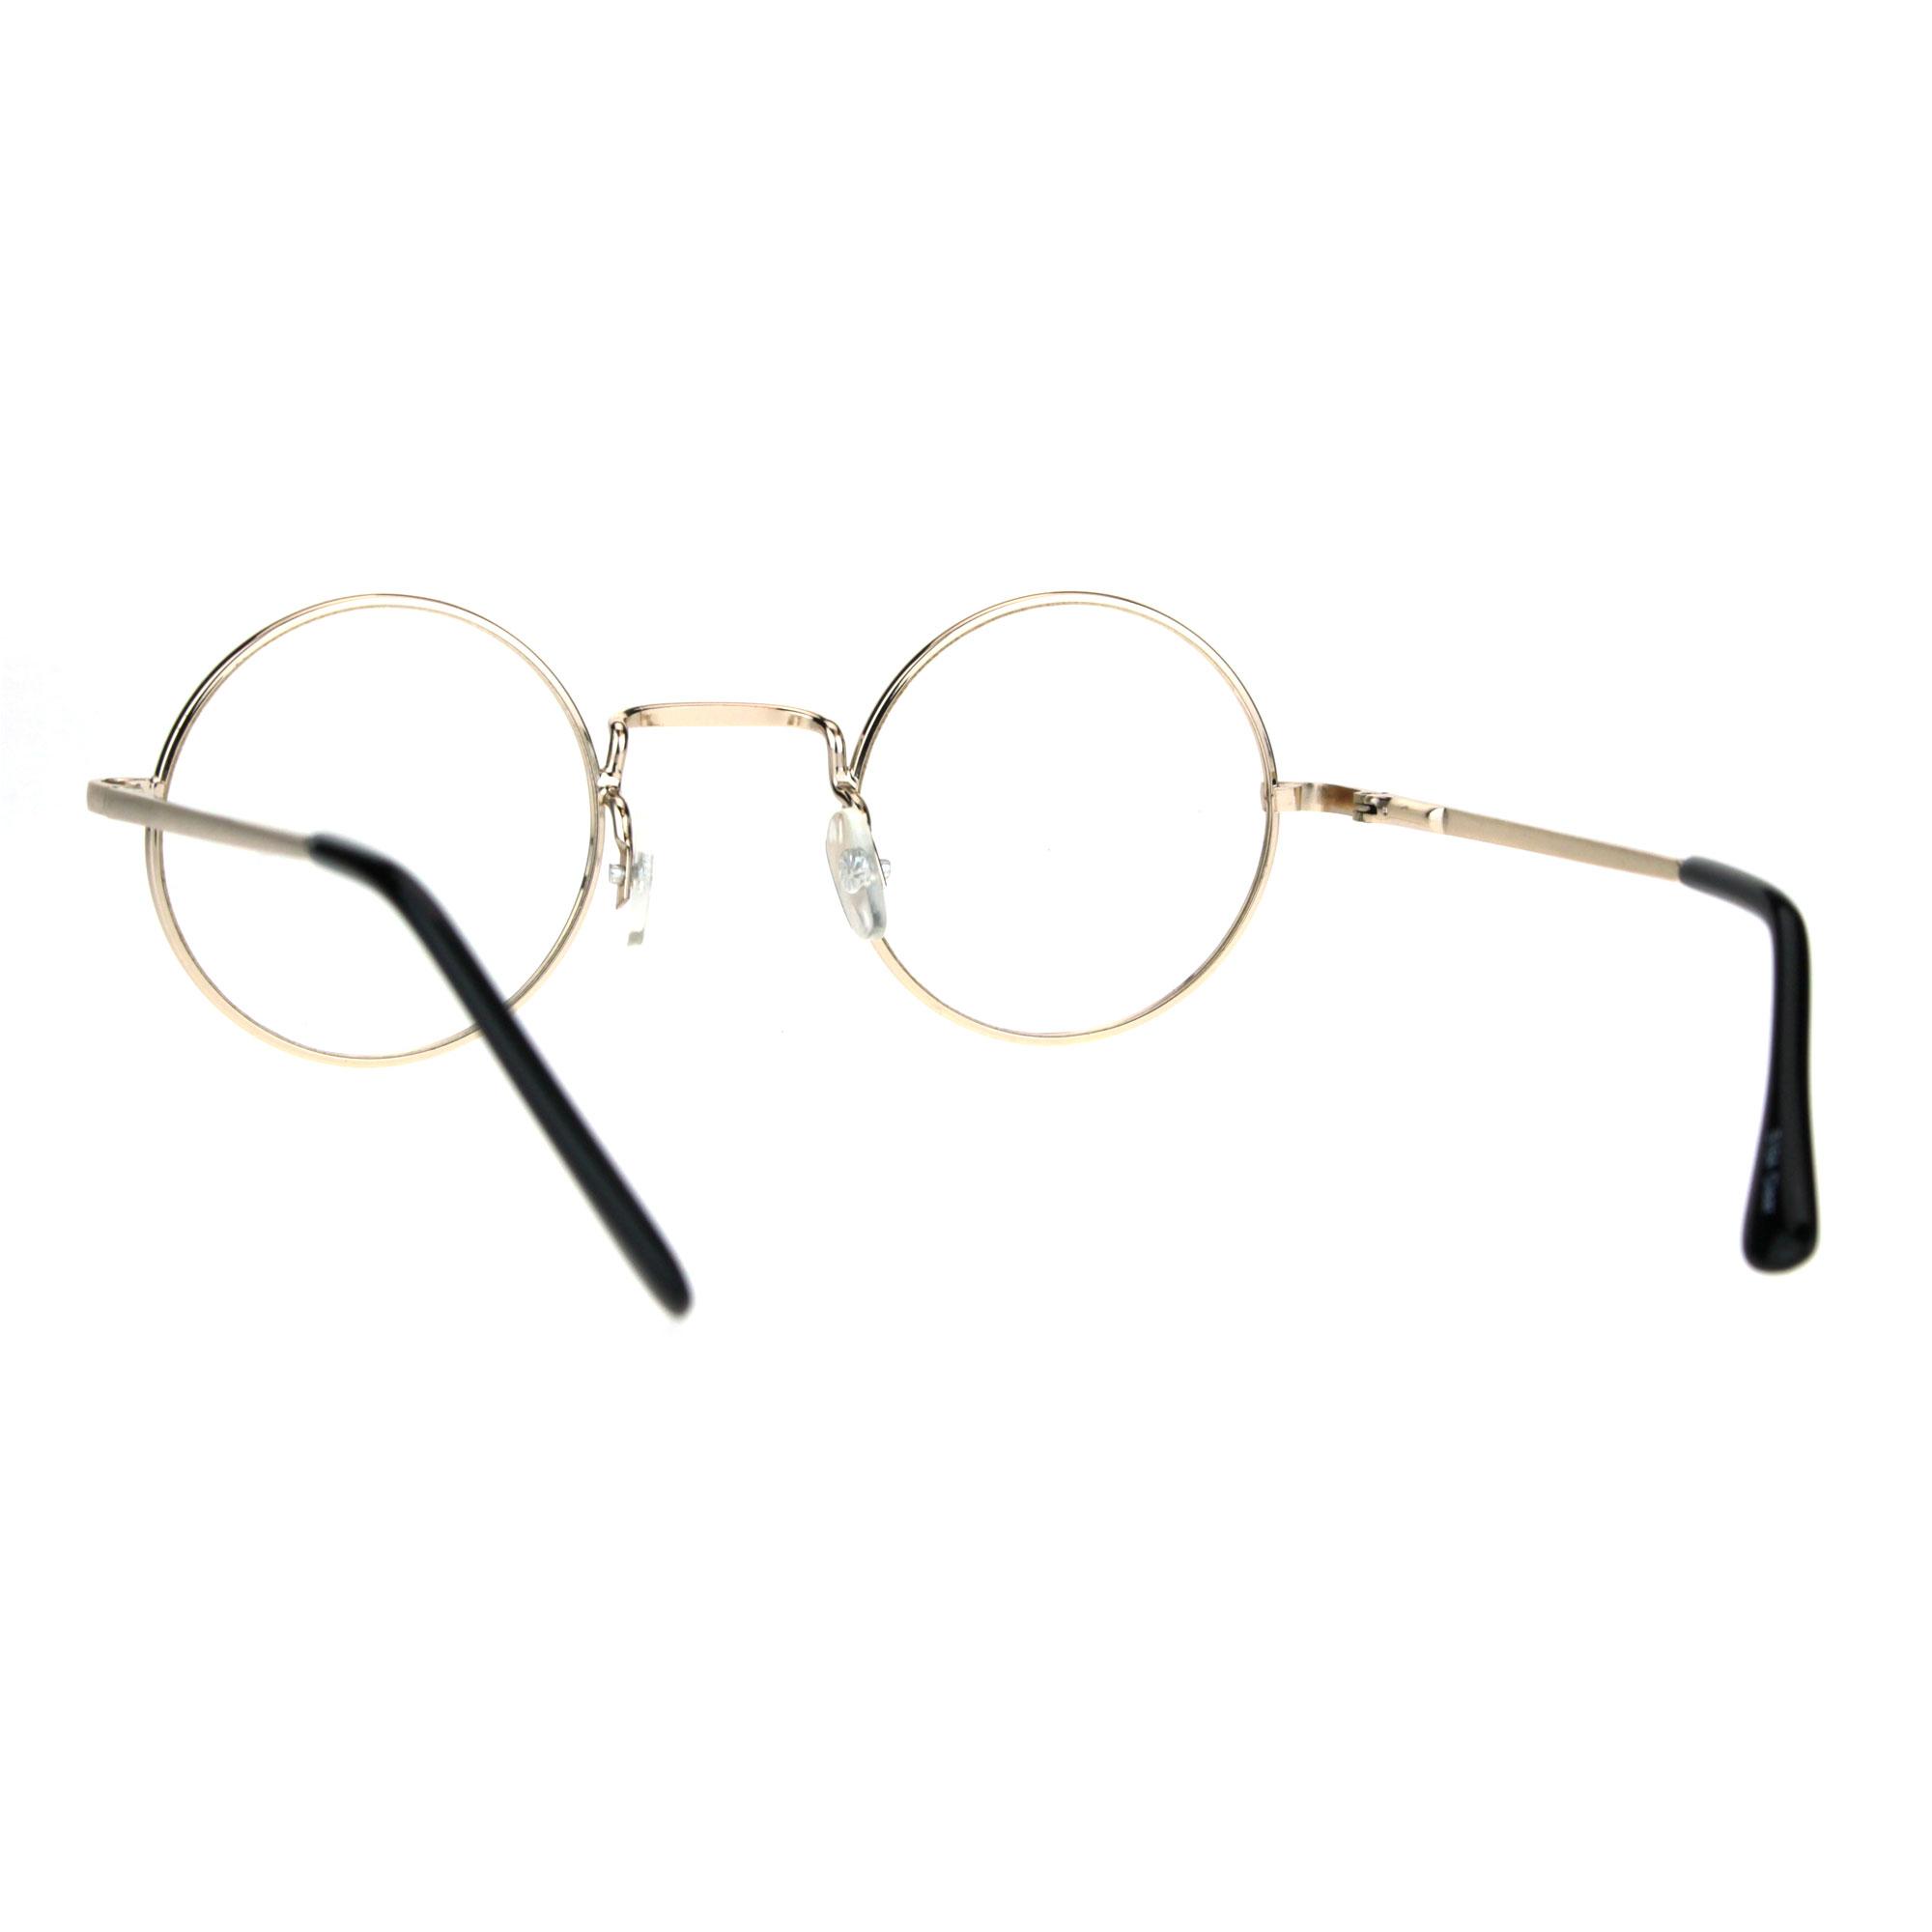 937c507708 Classic Metal Rim Round Circle Lens Pimp Hippie Clear Lens Eye ...